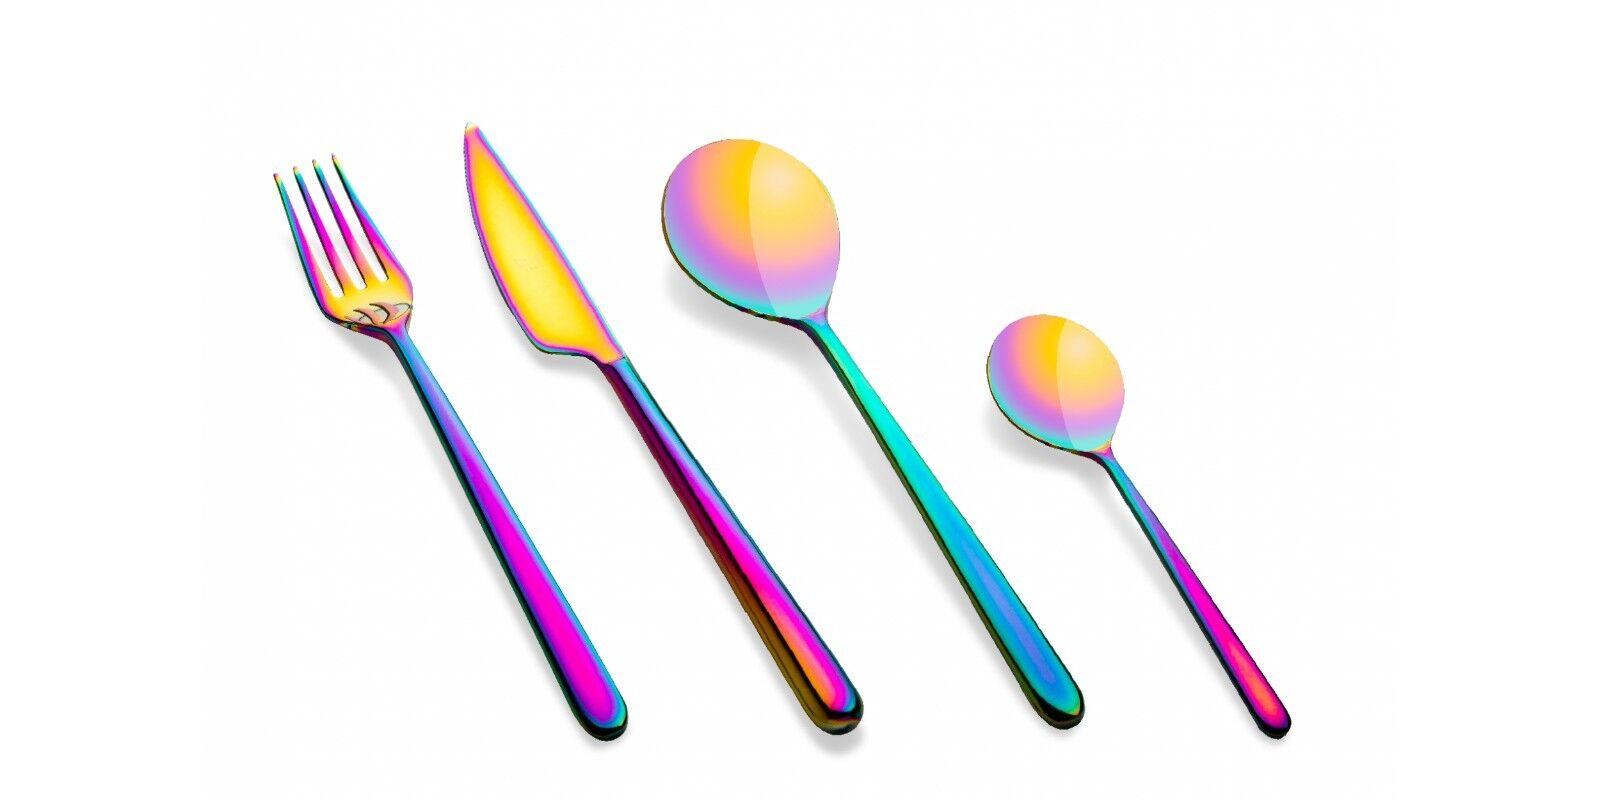 Mepra Mepra Mepra - Posto Tavola 4 Pezzi Posate Titanium Linea Rainbow The Luxury Art Mepra 7e364c